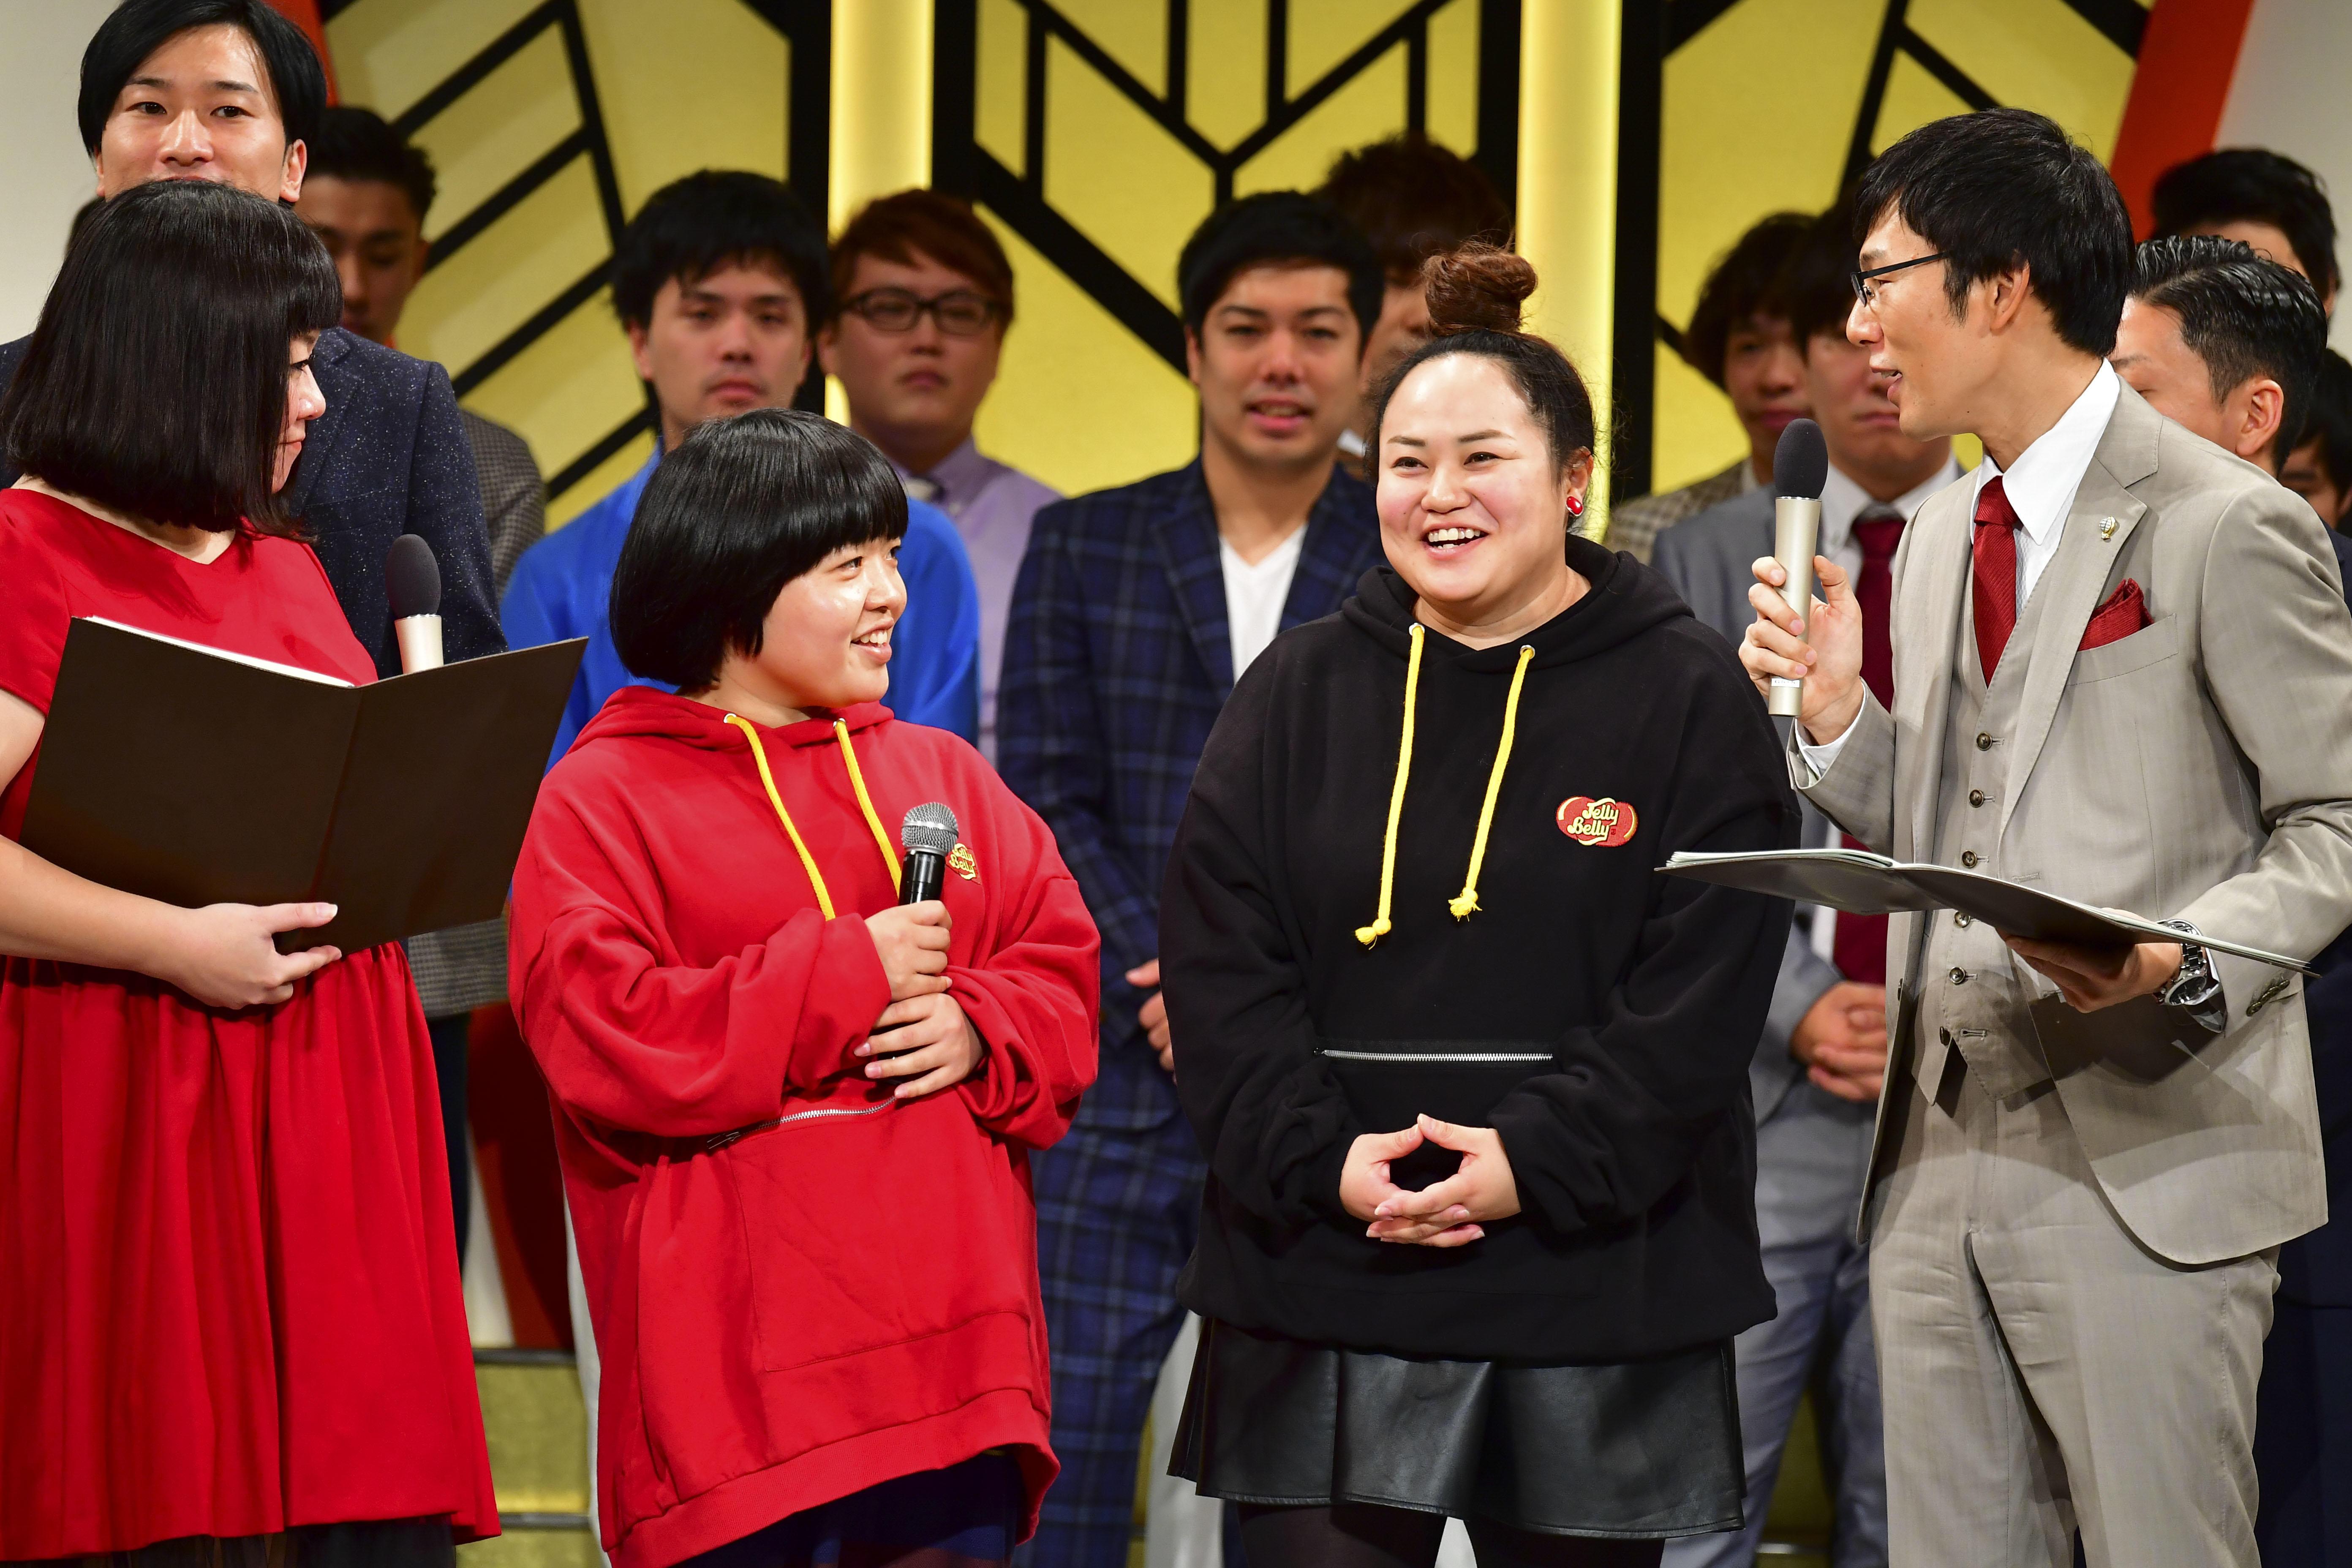 http://news.yoshimoto.co.jp/20171201191705-8618253f483516eb469443977d01265342eac1bf.jpg